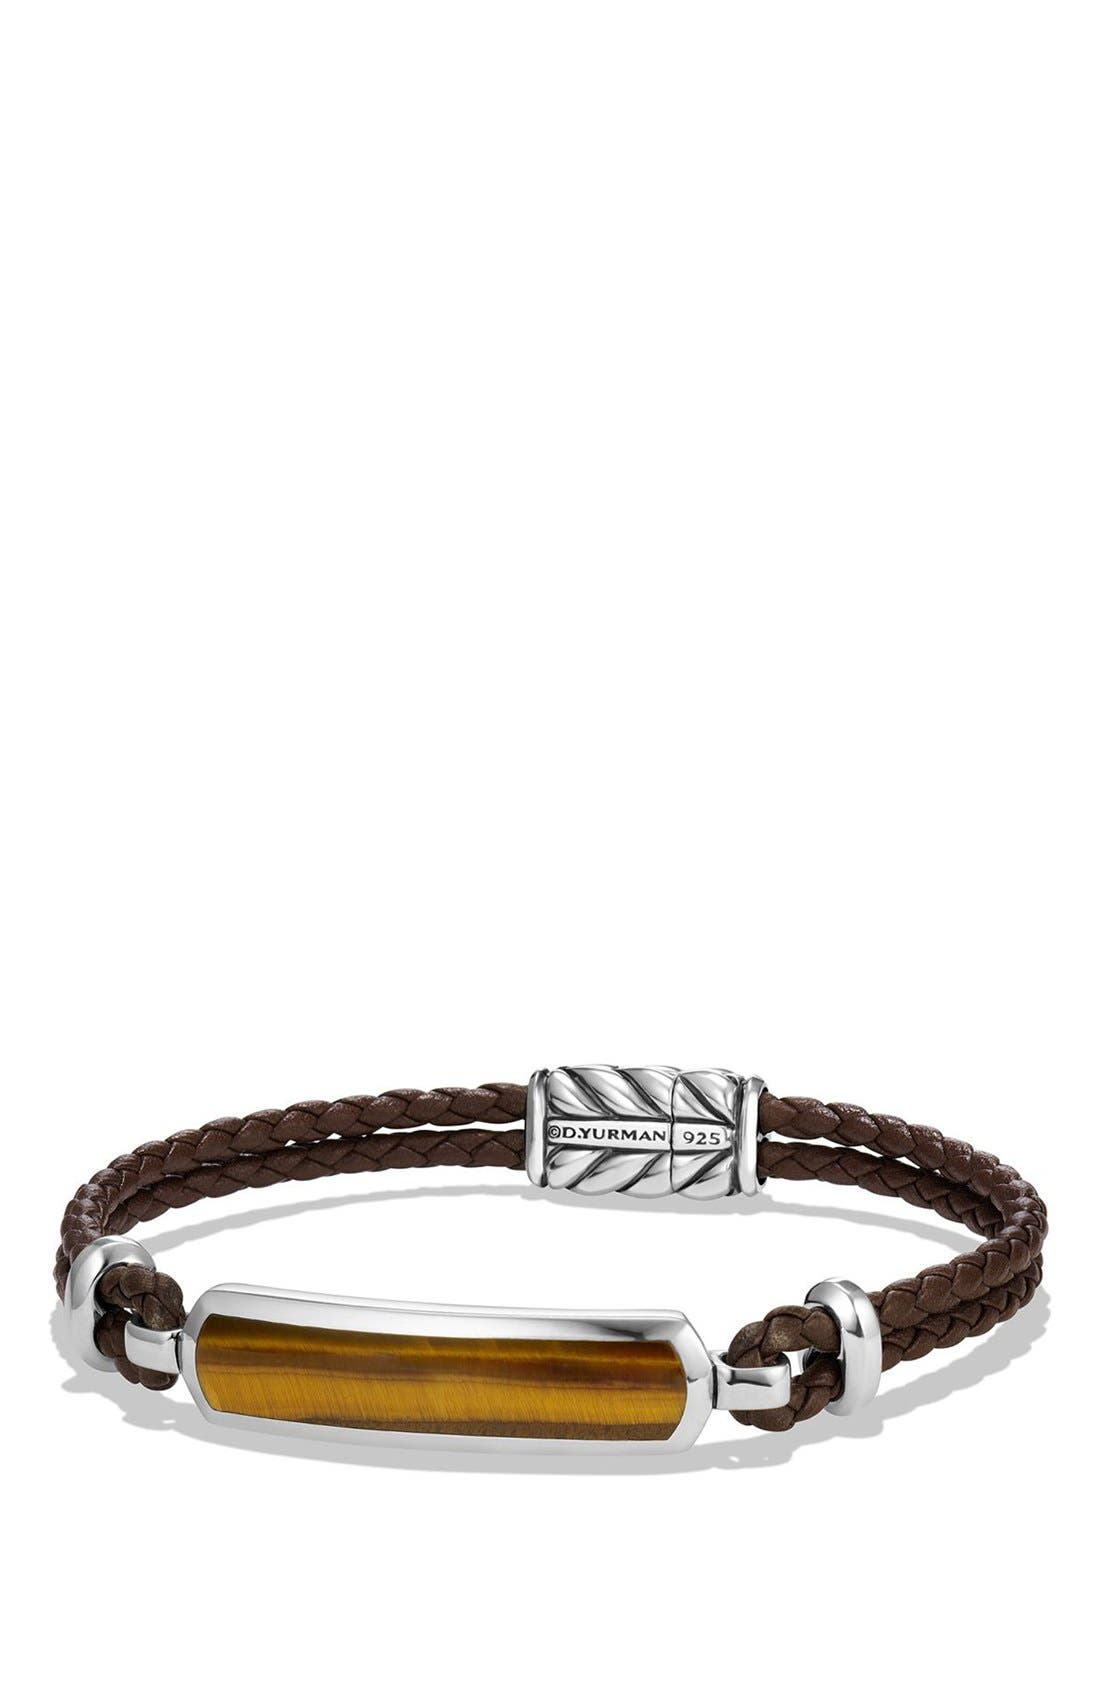 DAVID YURMAN Bar Station Leather Bracelet